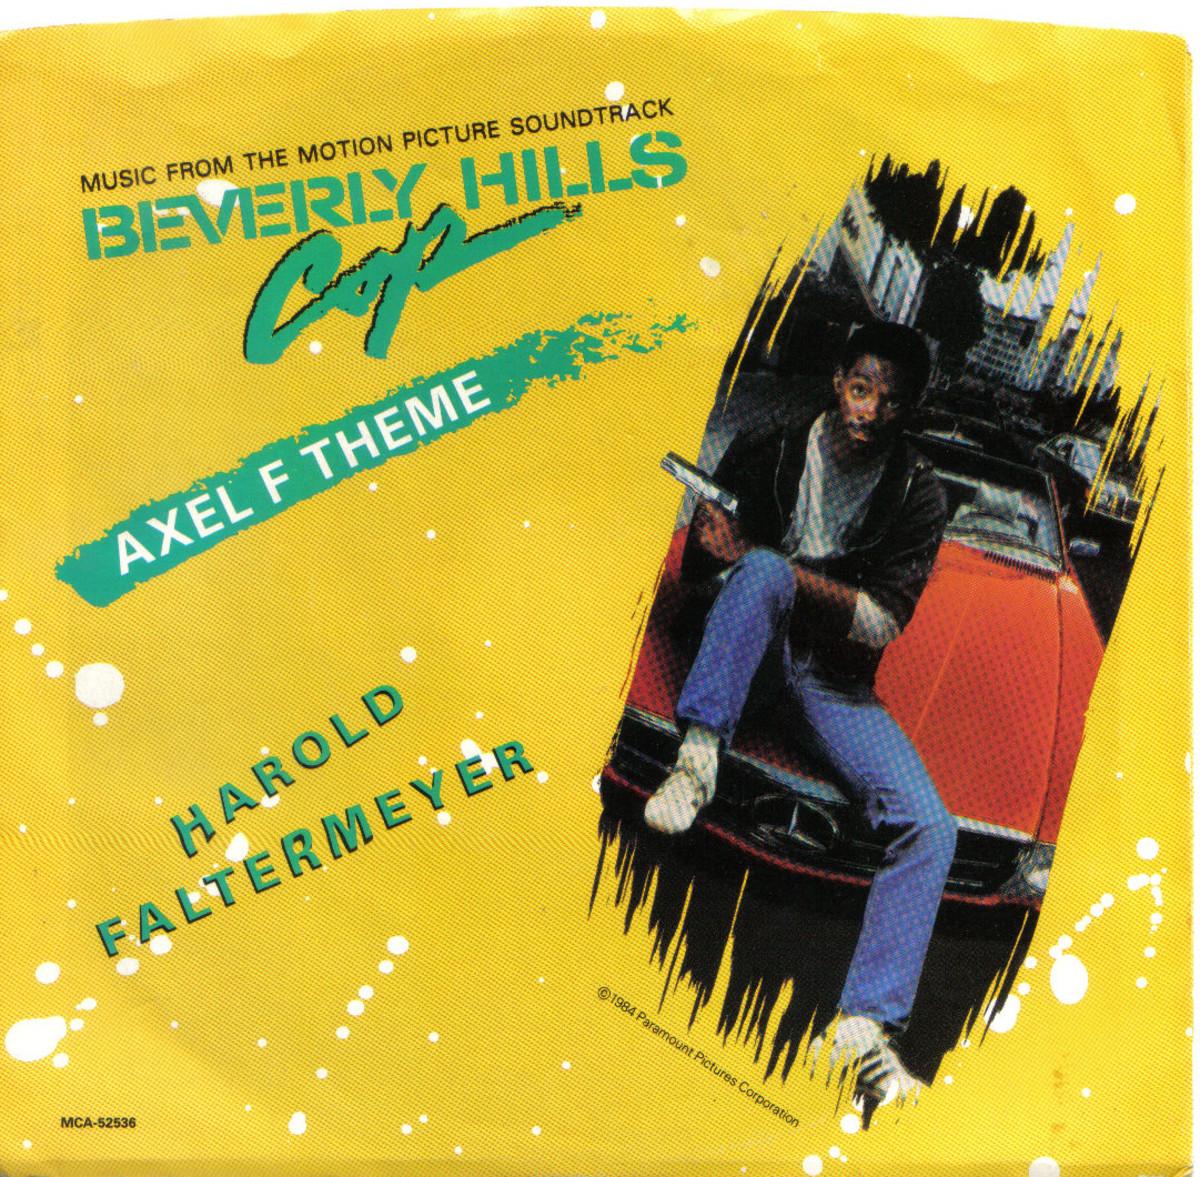 Axel F Theme by Harold Faltermeyer